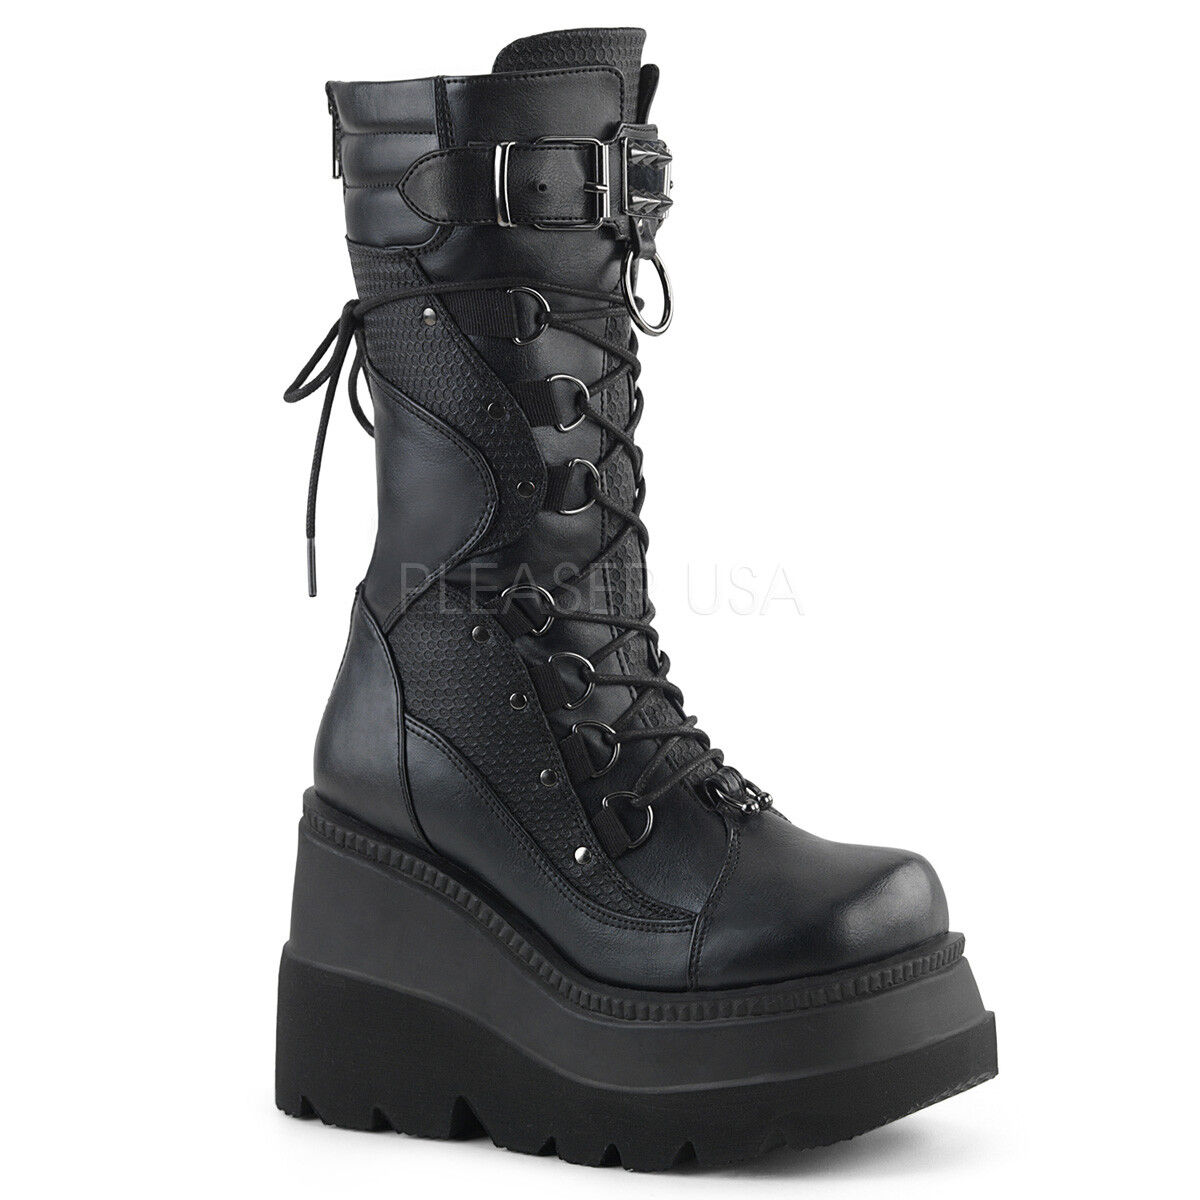 Demonia 4.5  Platform Vegan Stacked Metal Spiked Pierced Boots Club Goth 6-12